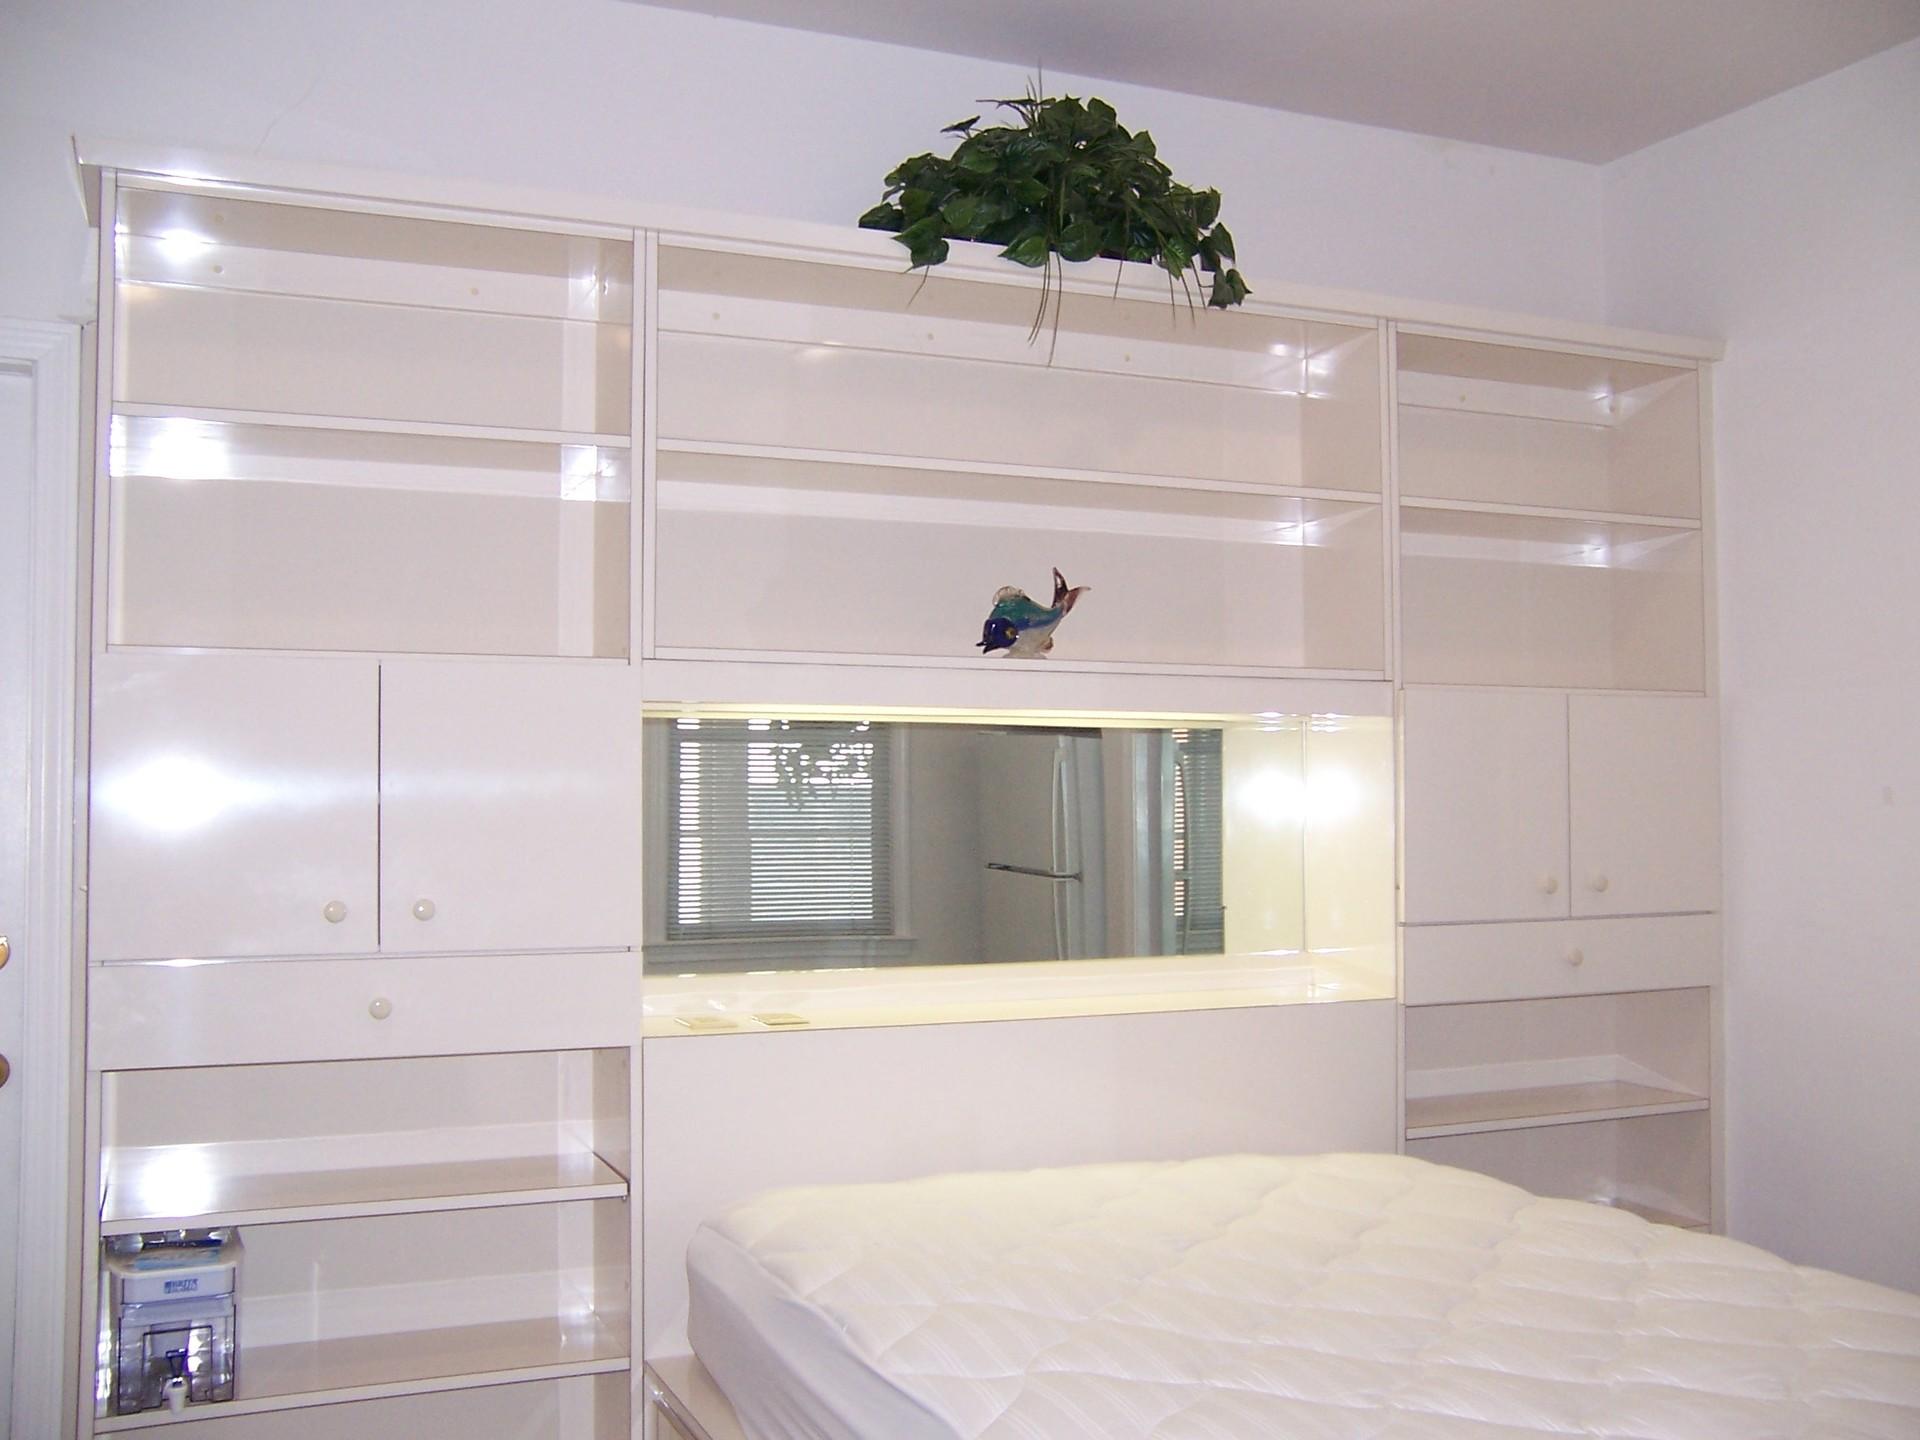 Furnished Room For Female